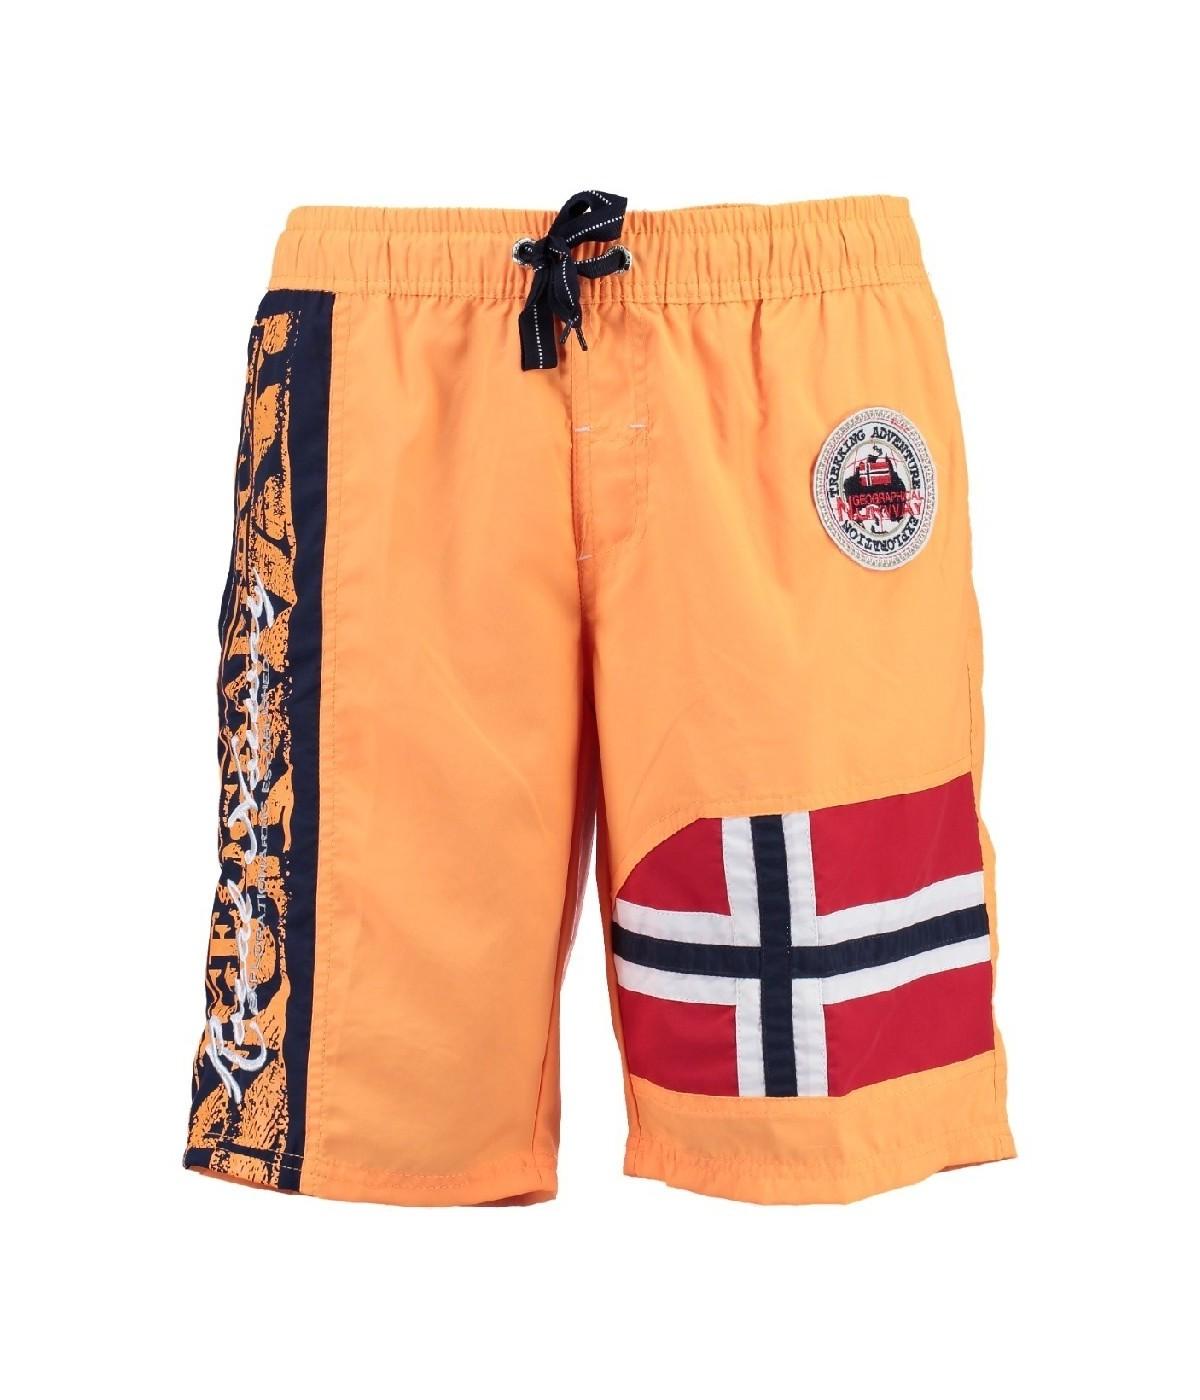 Maillot de Bain Geographical Norway Quemen Orange